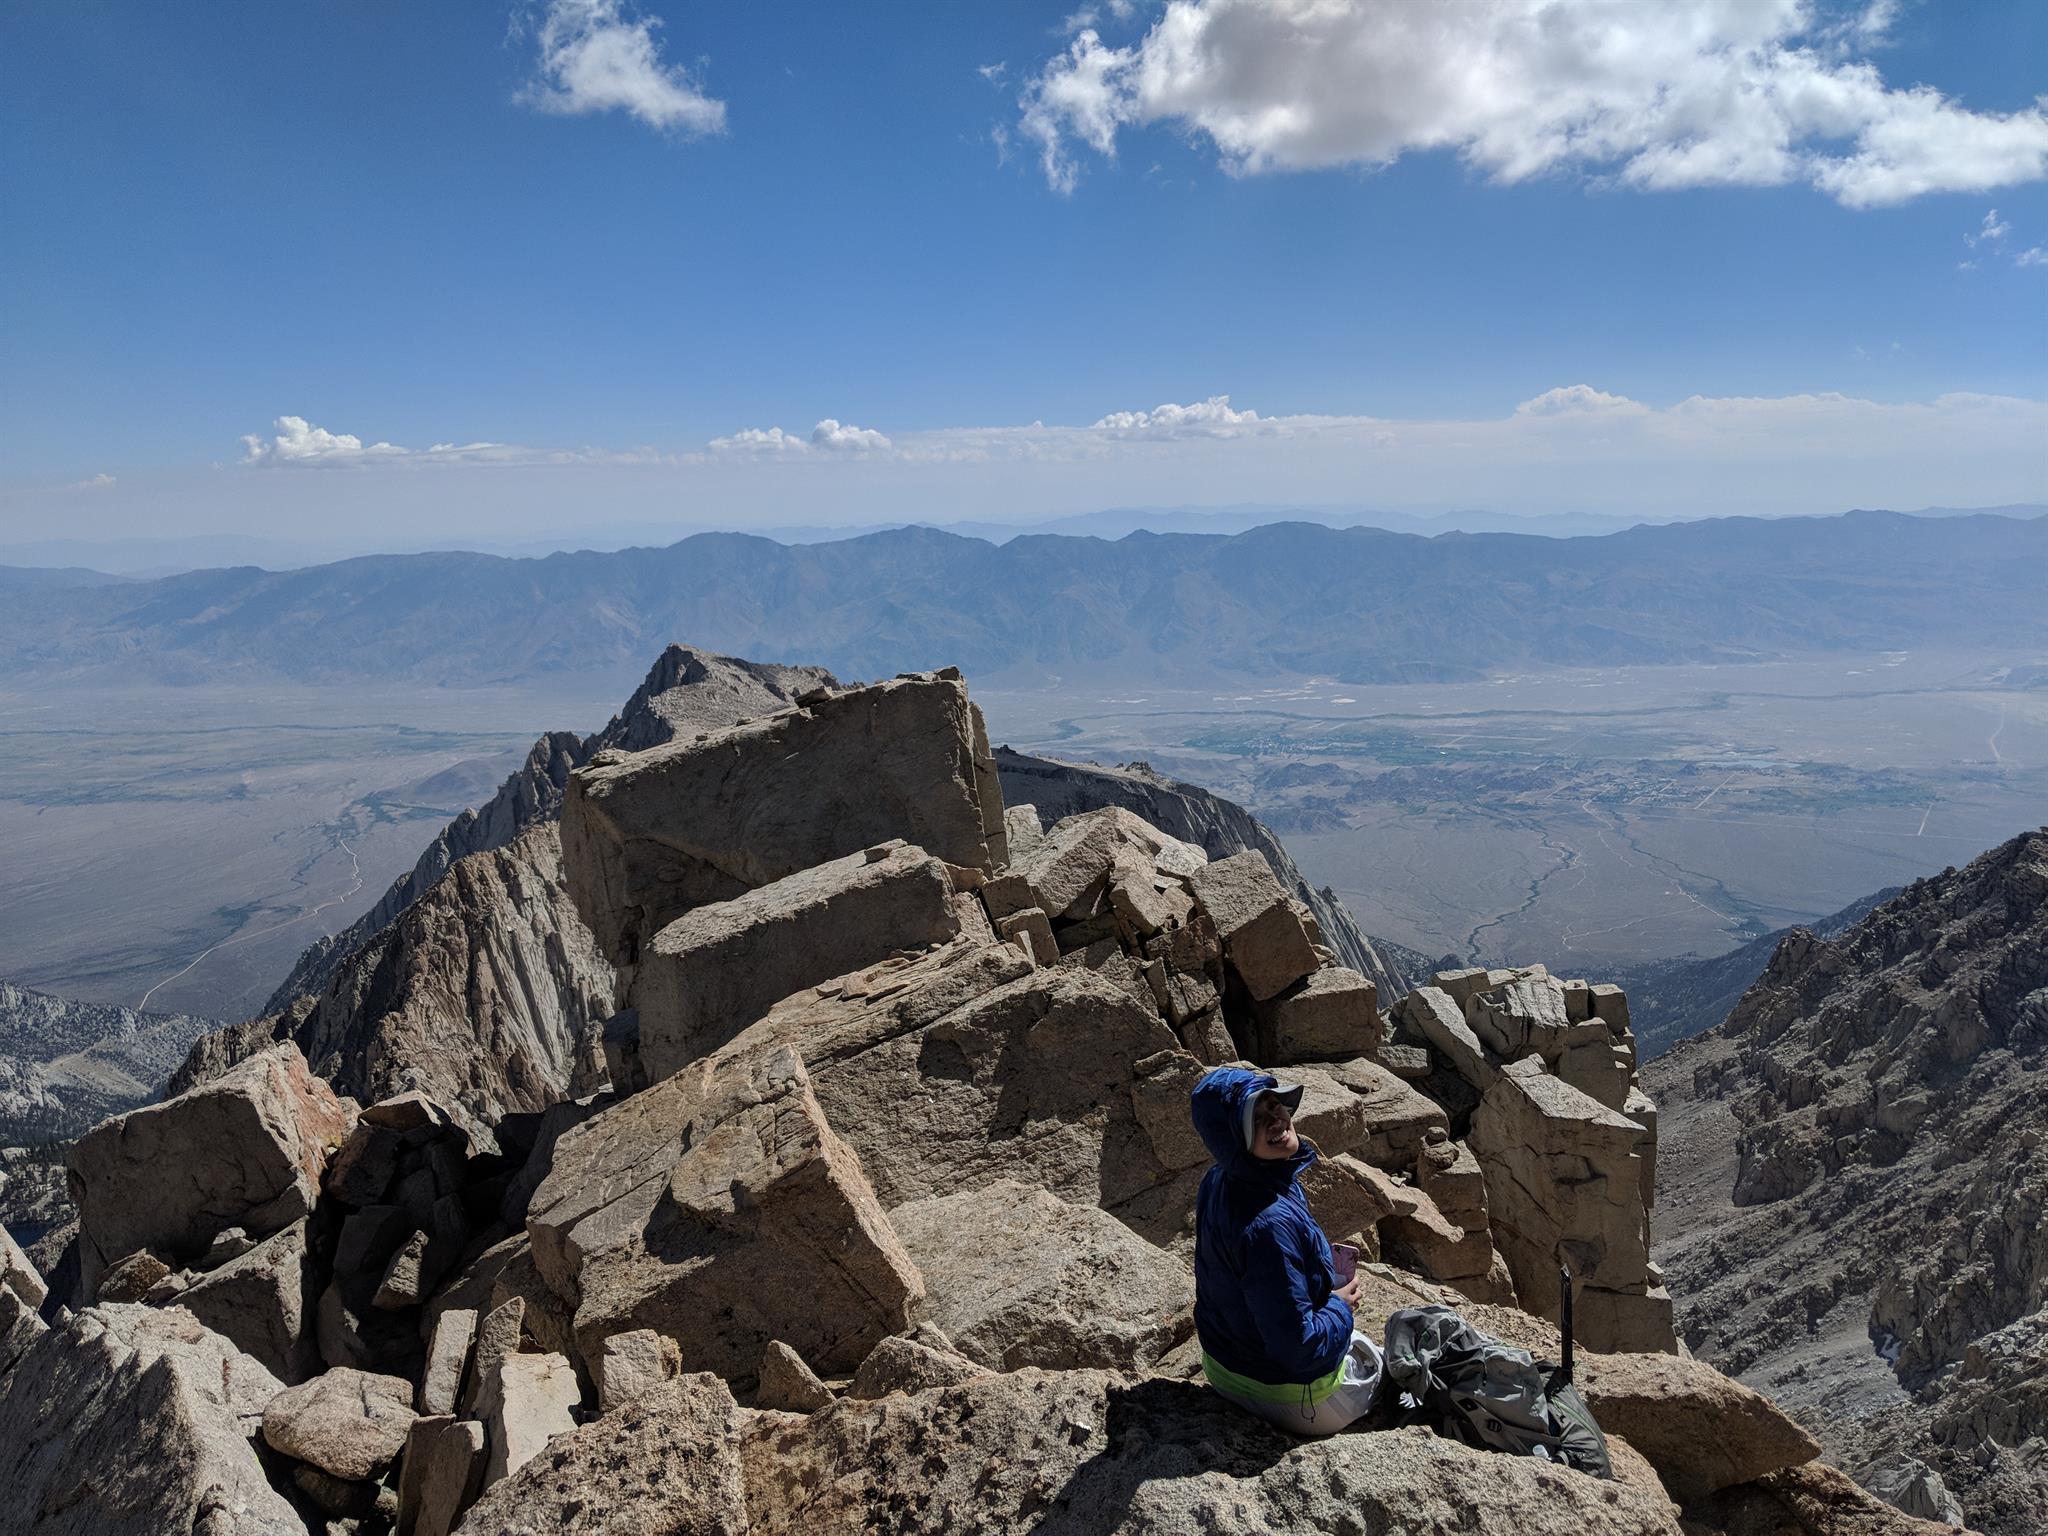 Mount LeConte - Peakbagger.com